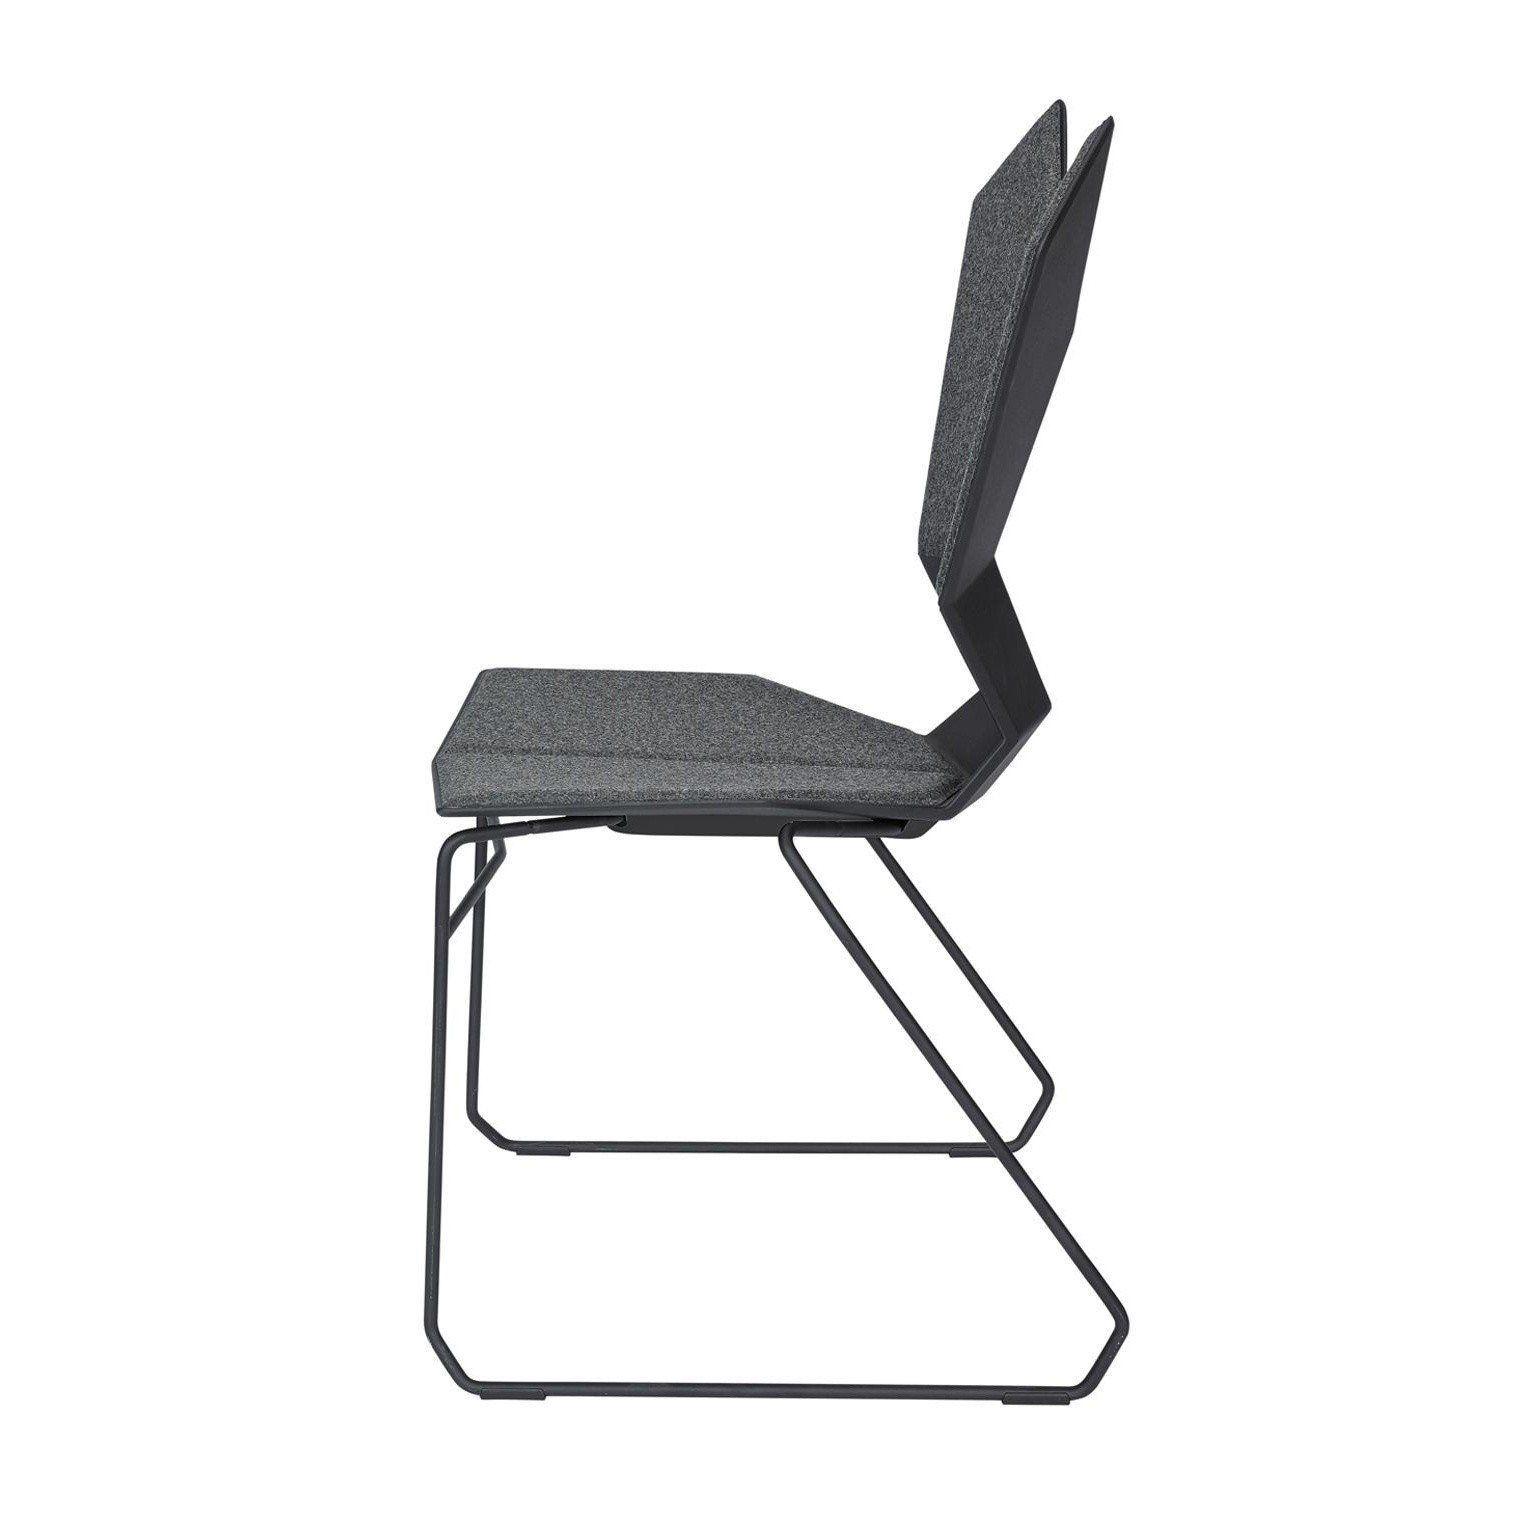 tom dixon y chair chaise avec patins ambientedirect. Black Bedroom Furniture Sets. Home Design Ideas